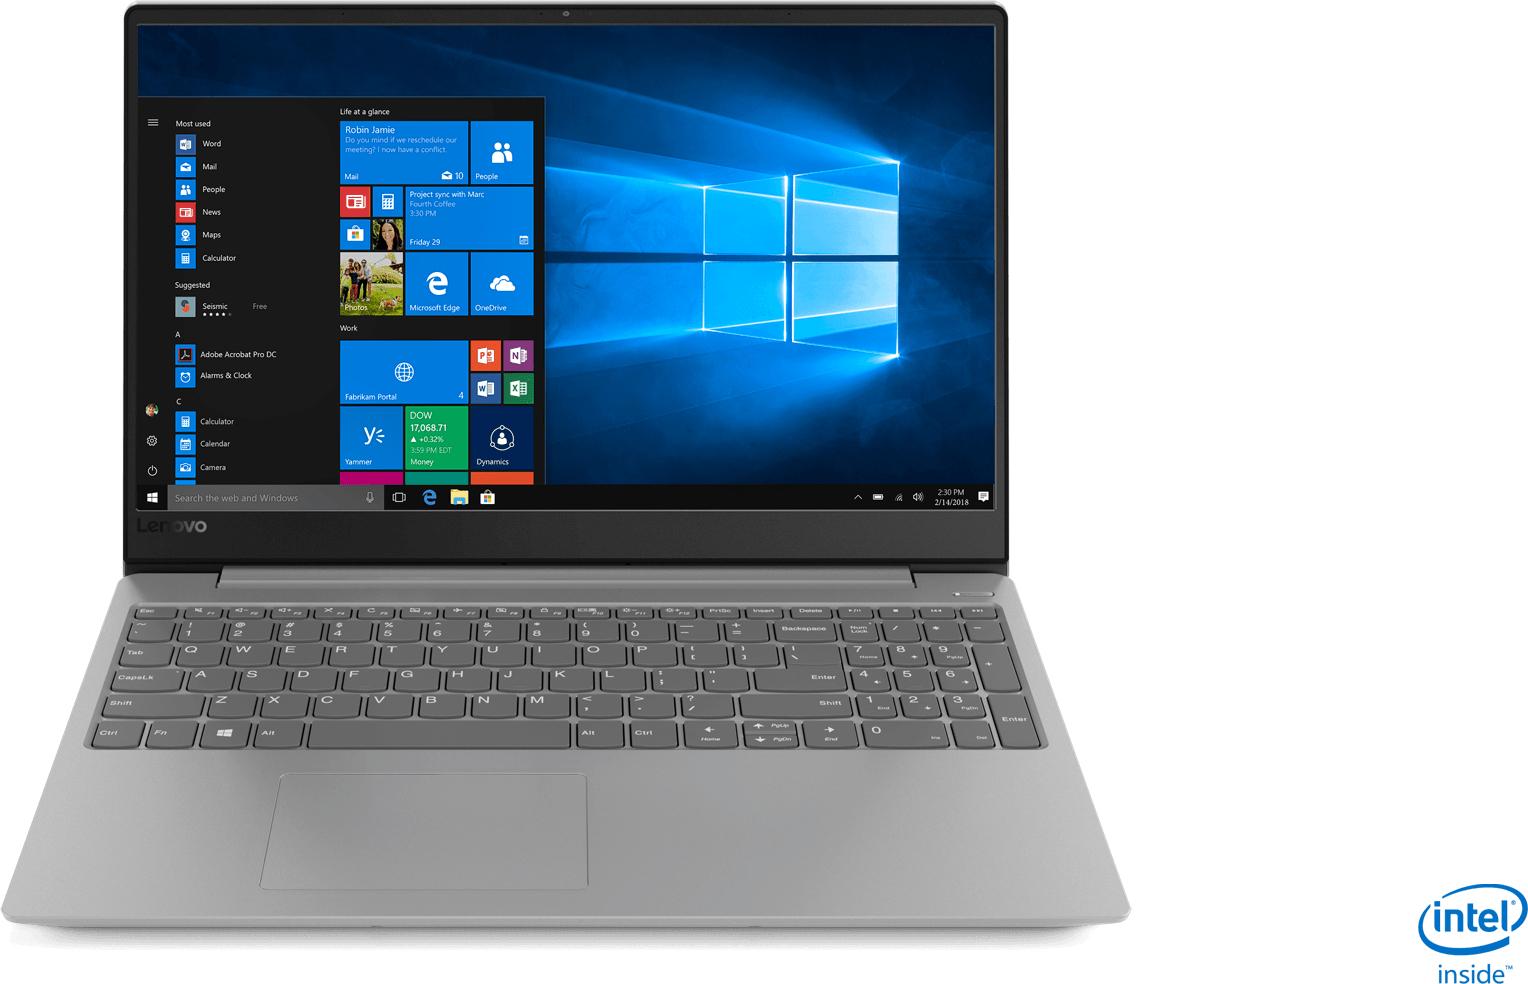 "Lenovo Ideapad 330s 15,6"" laptop (i7 - 8GB/256GB) @ Lenovo Shop"